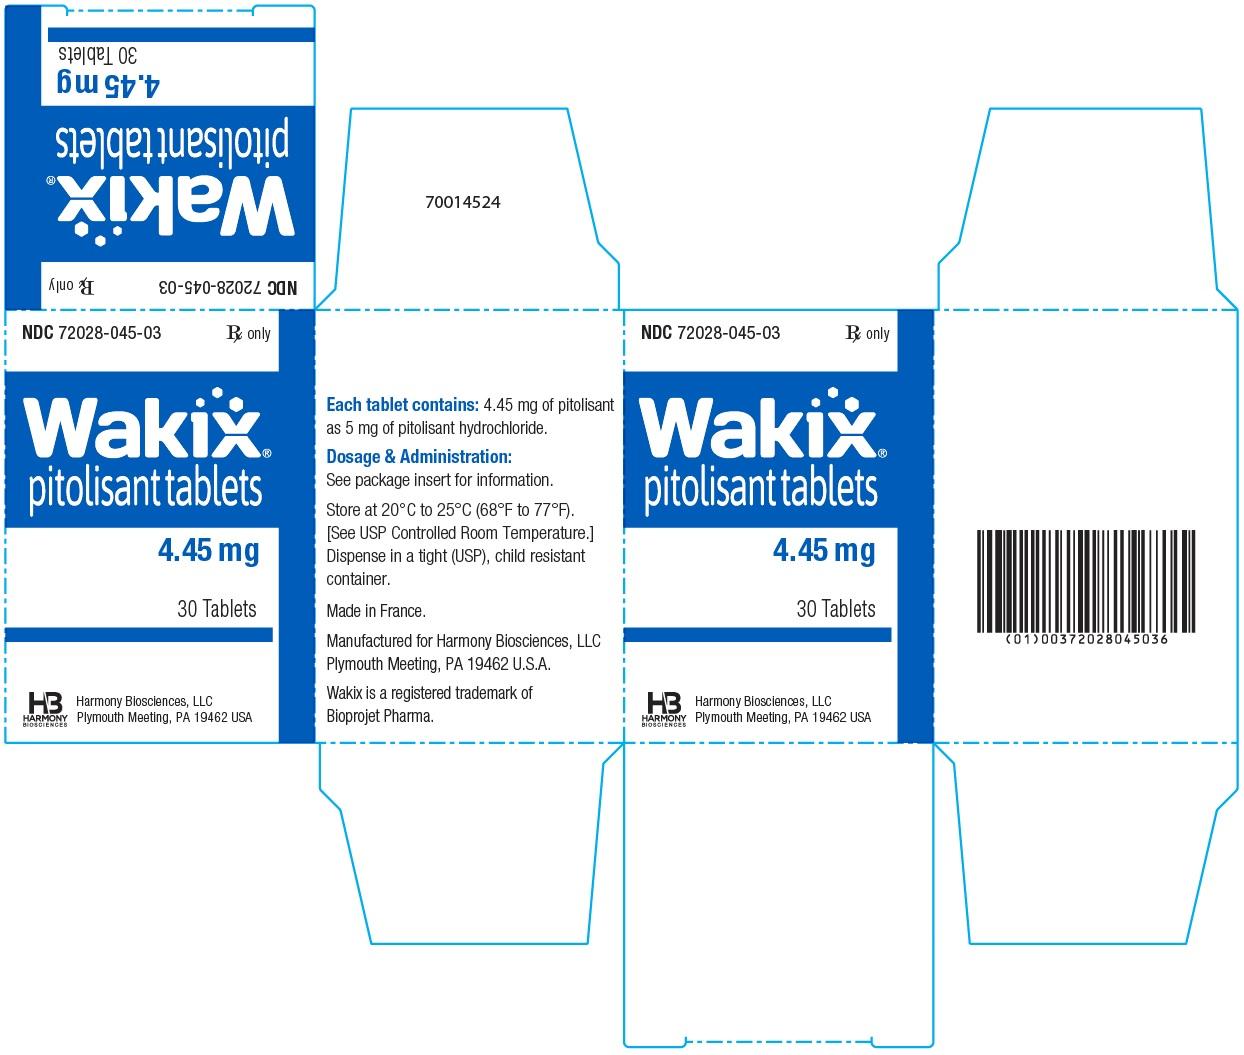 4.45 mg Carton Label